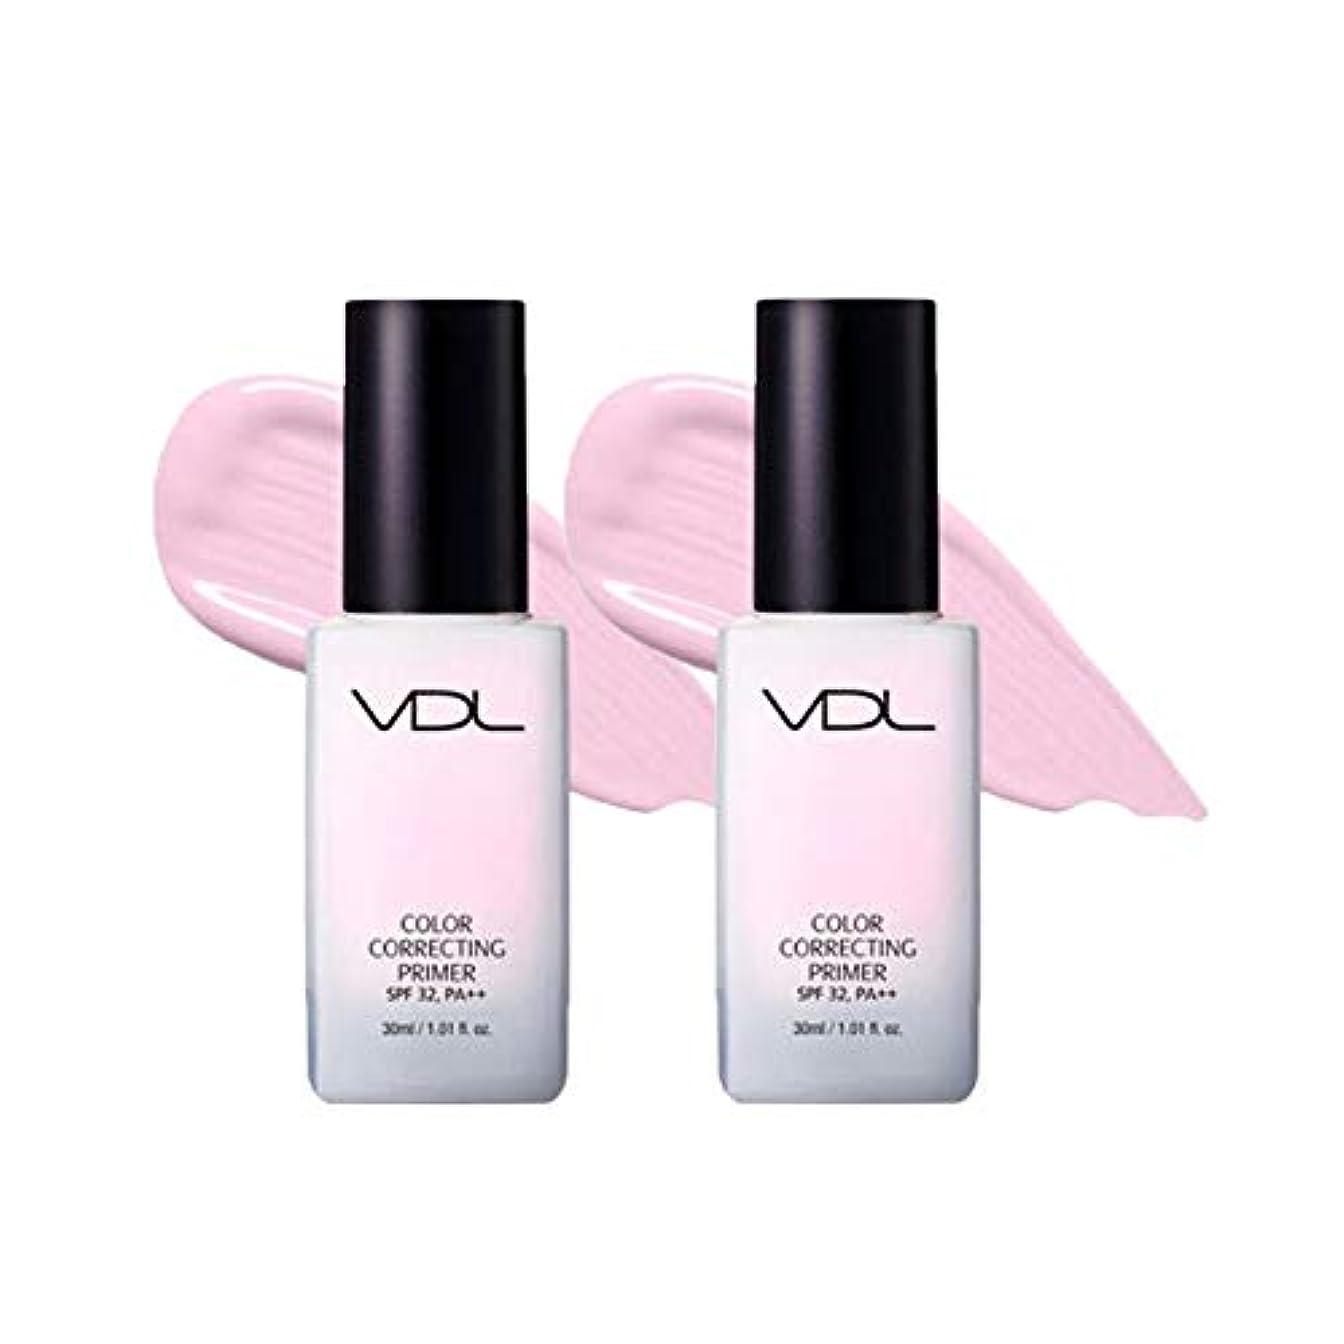 VDLカラーコレクティングプライマー30mlx2本セット3カラーのメイクアップベース韓国コスメ、VDL Color Correcting Primer 30ml x 2ea Set 3-Colors Make-up Base...